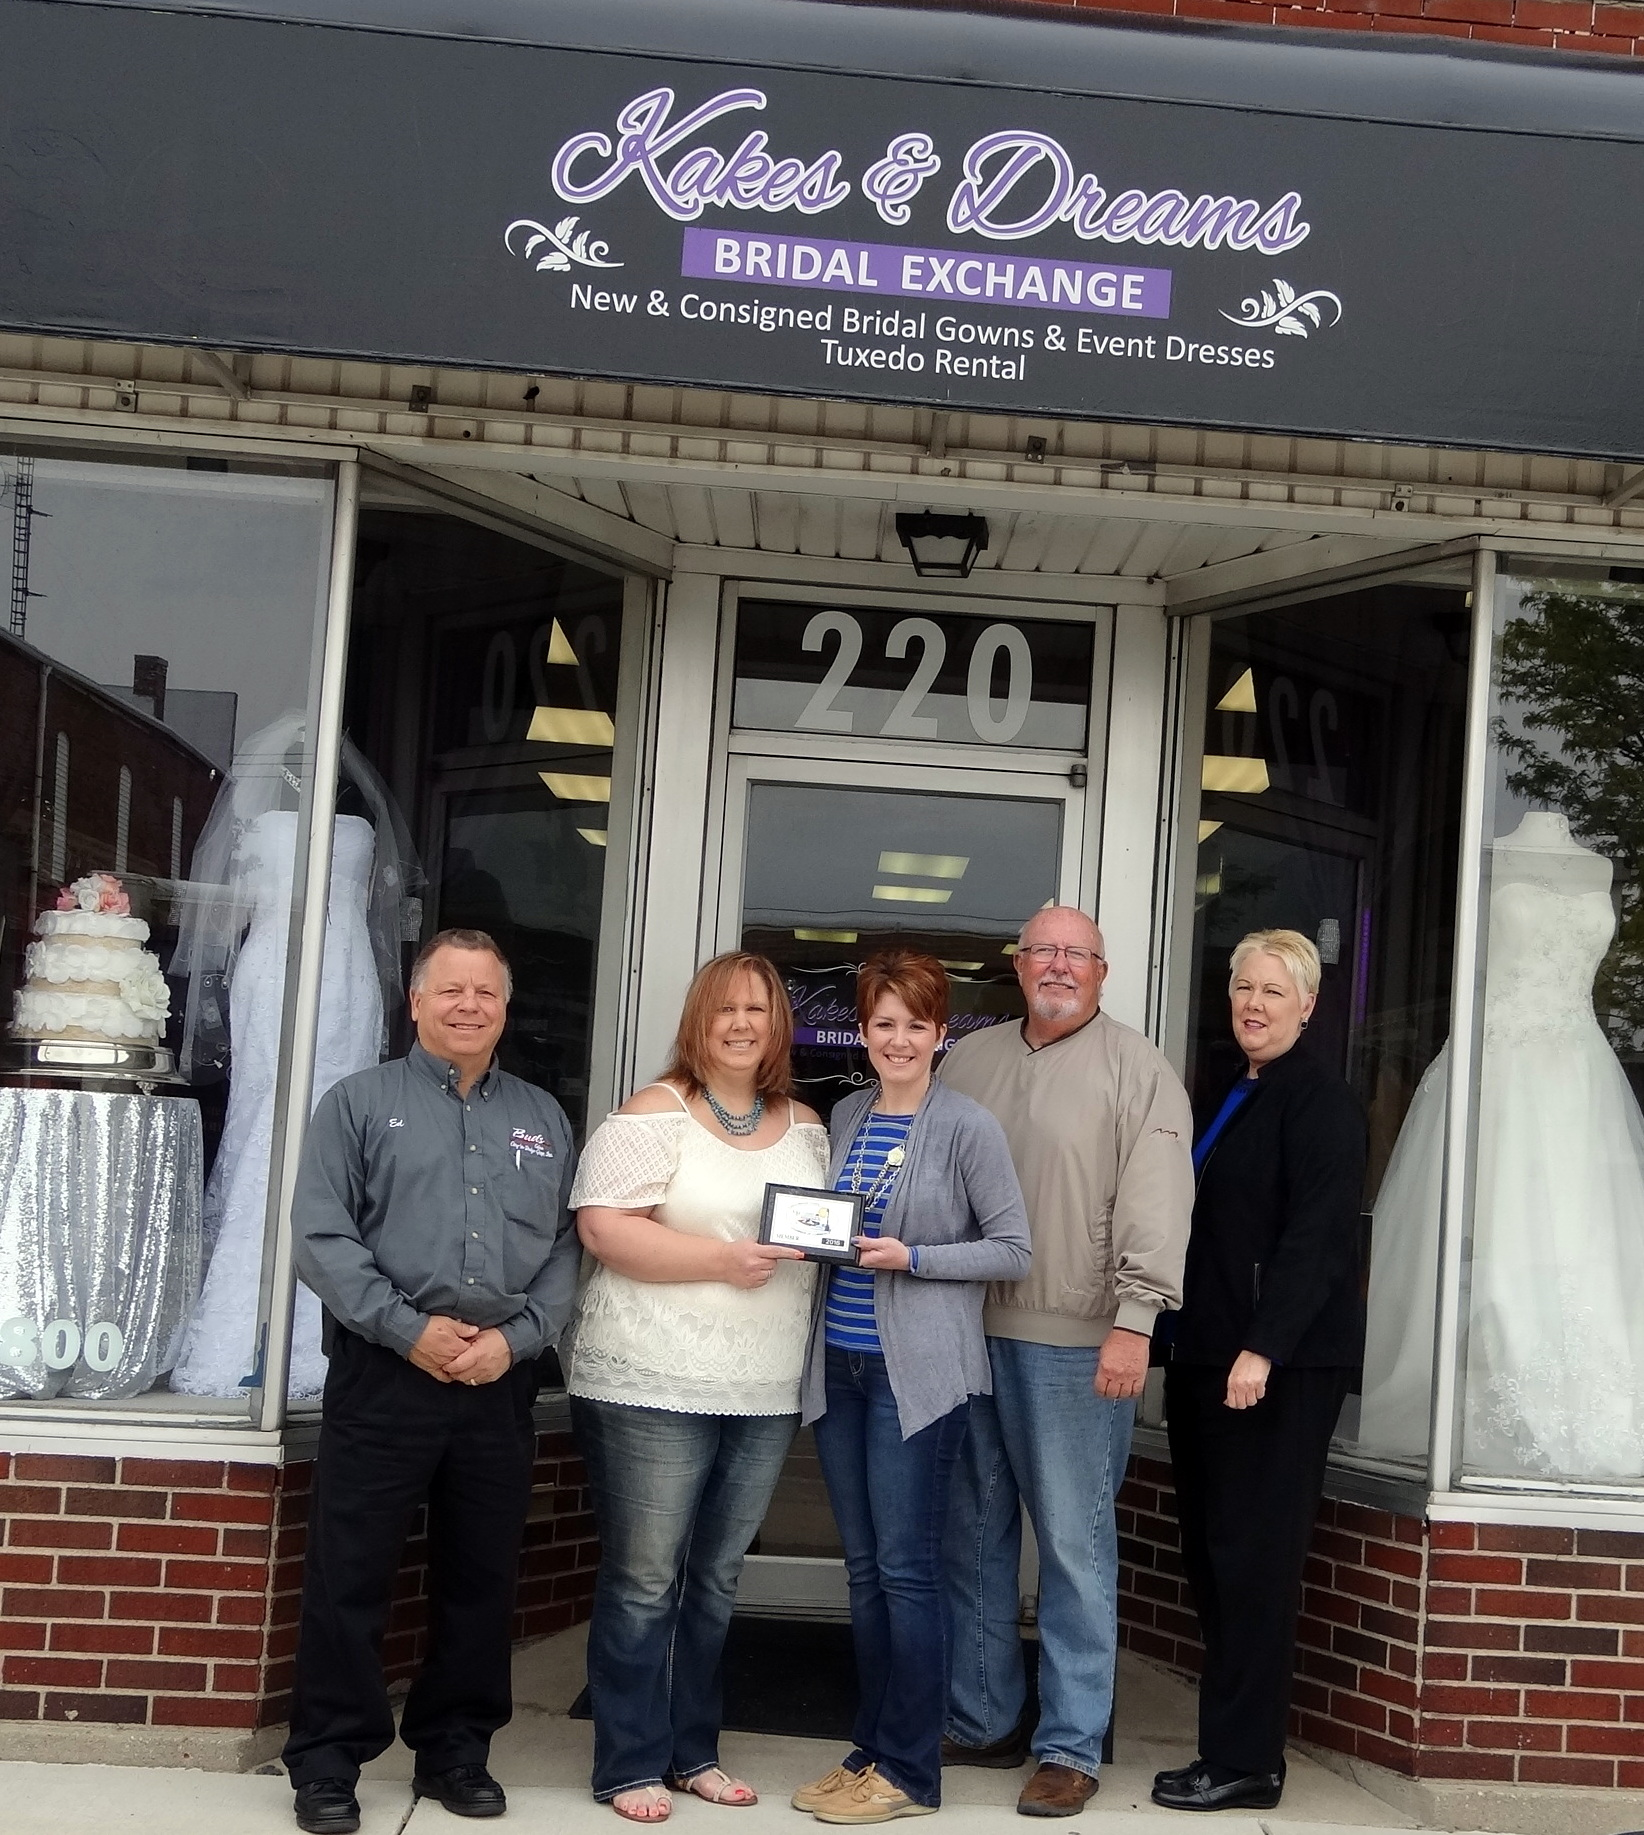 Kakes & Dreams Bridal Exchange LLC Joins Celina Mercer Co Chamber